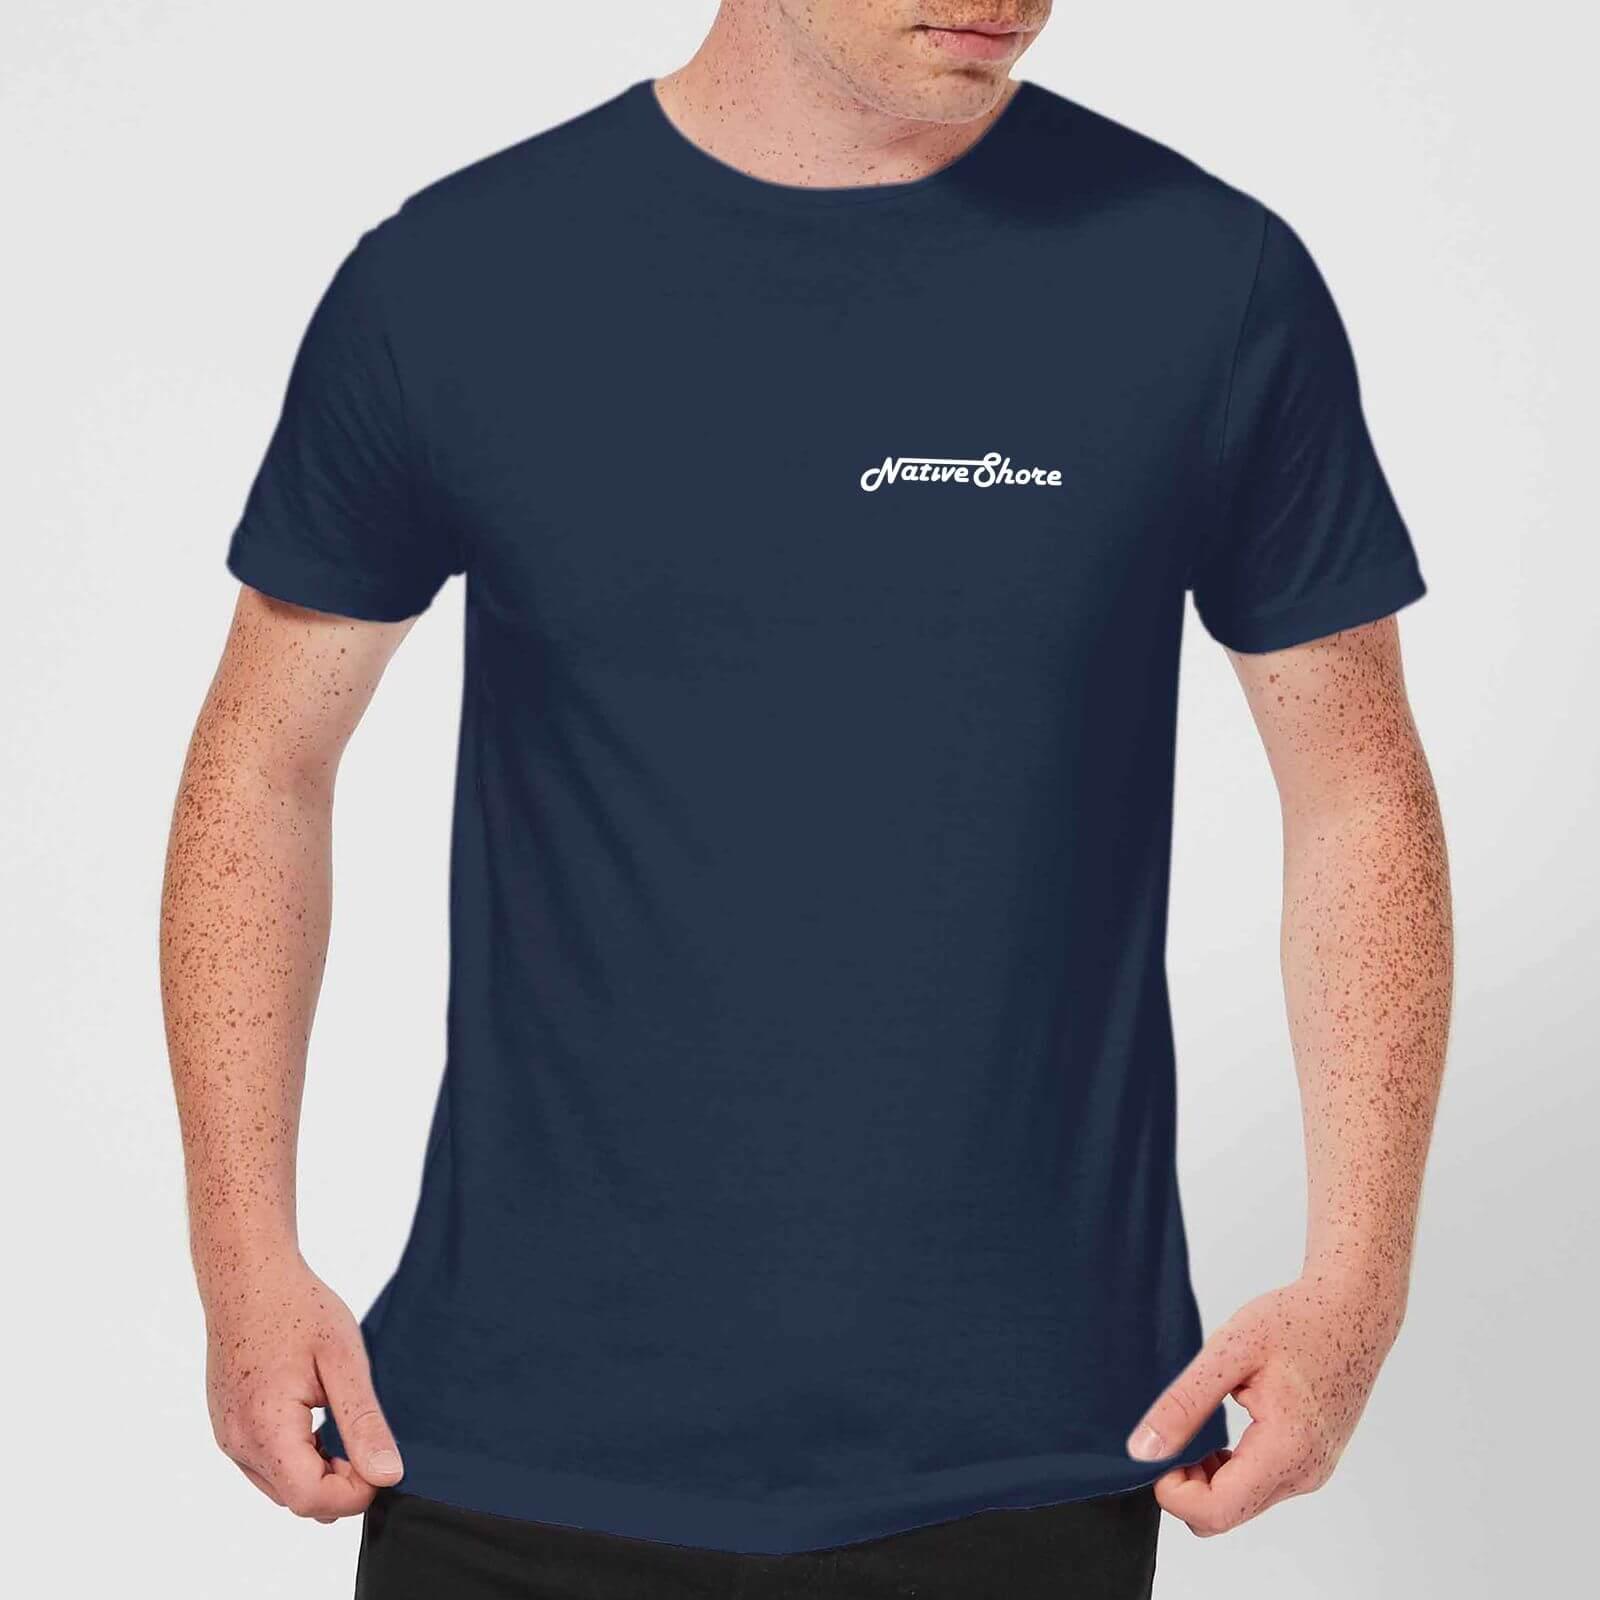 san francisco ee828 0e85b Native Shore Men s Original Shore T-Shirt - Navy Clothing   Zavvi US